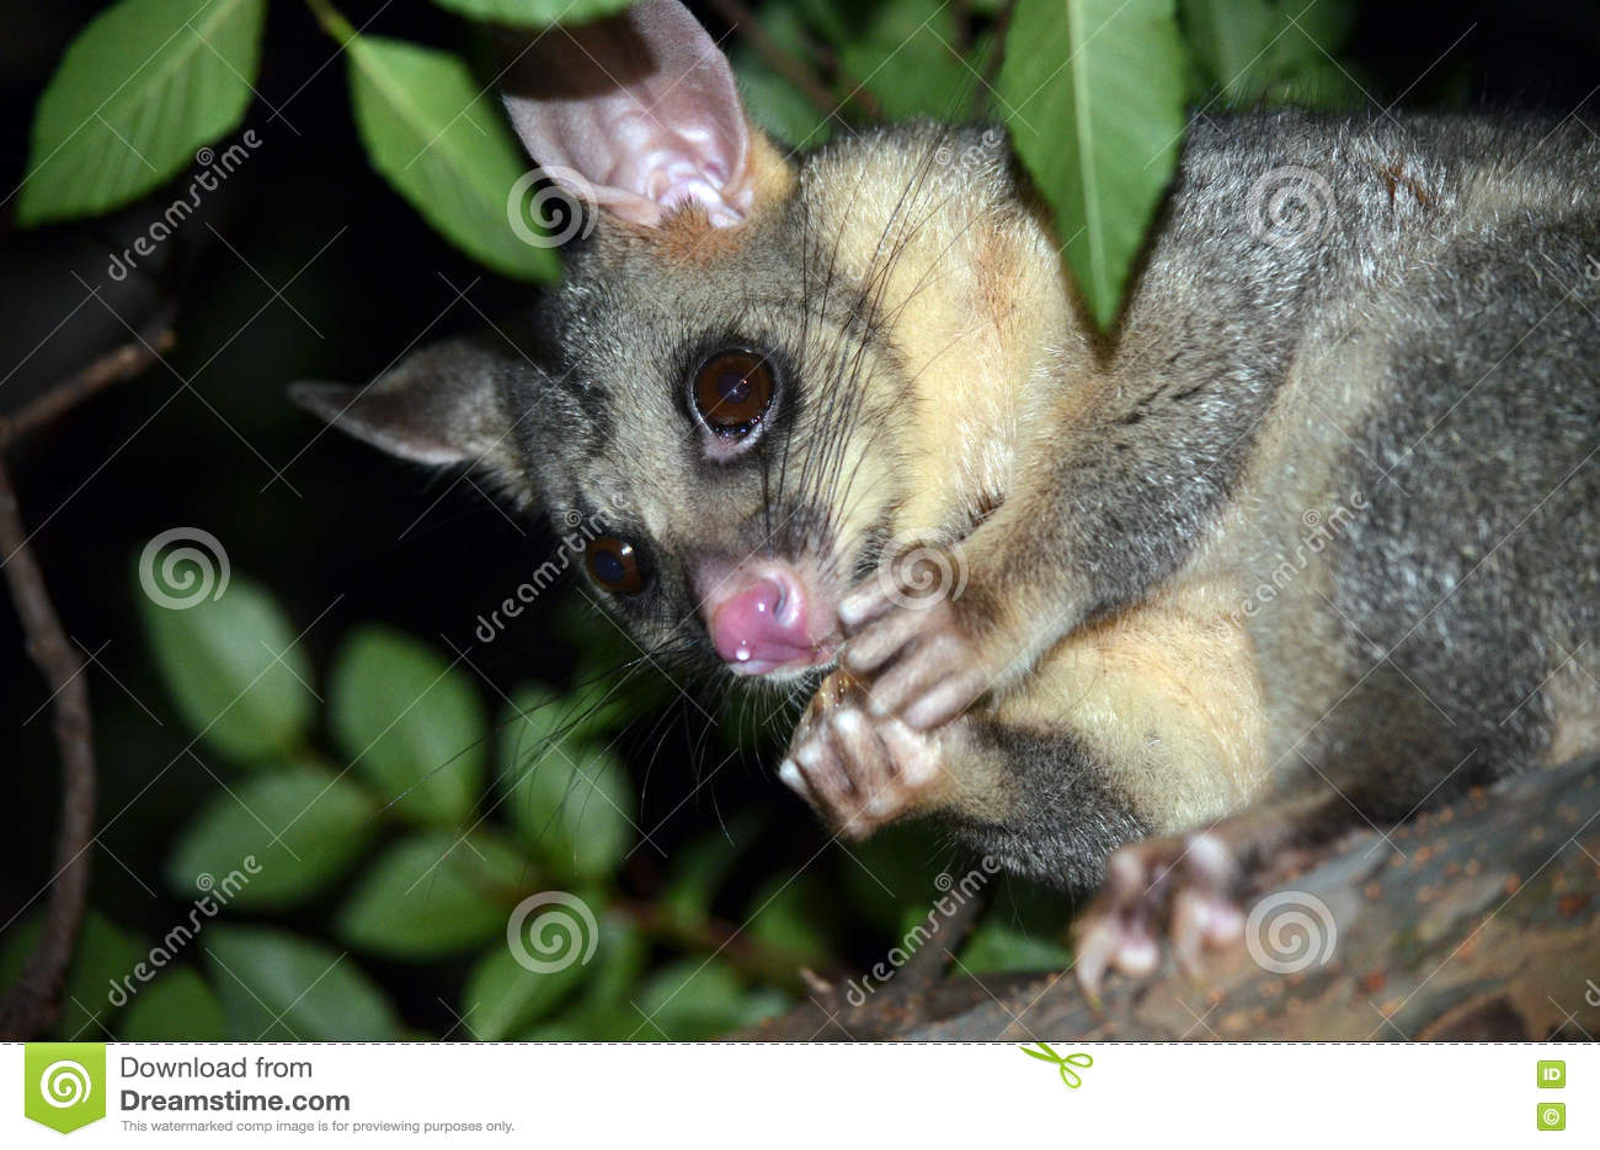 possum in backyard home decorating ideas